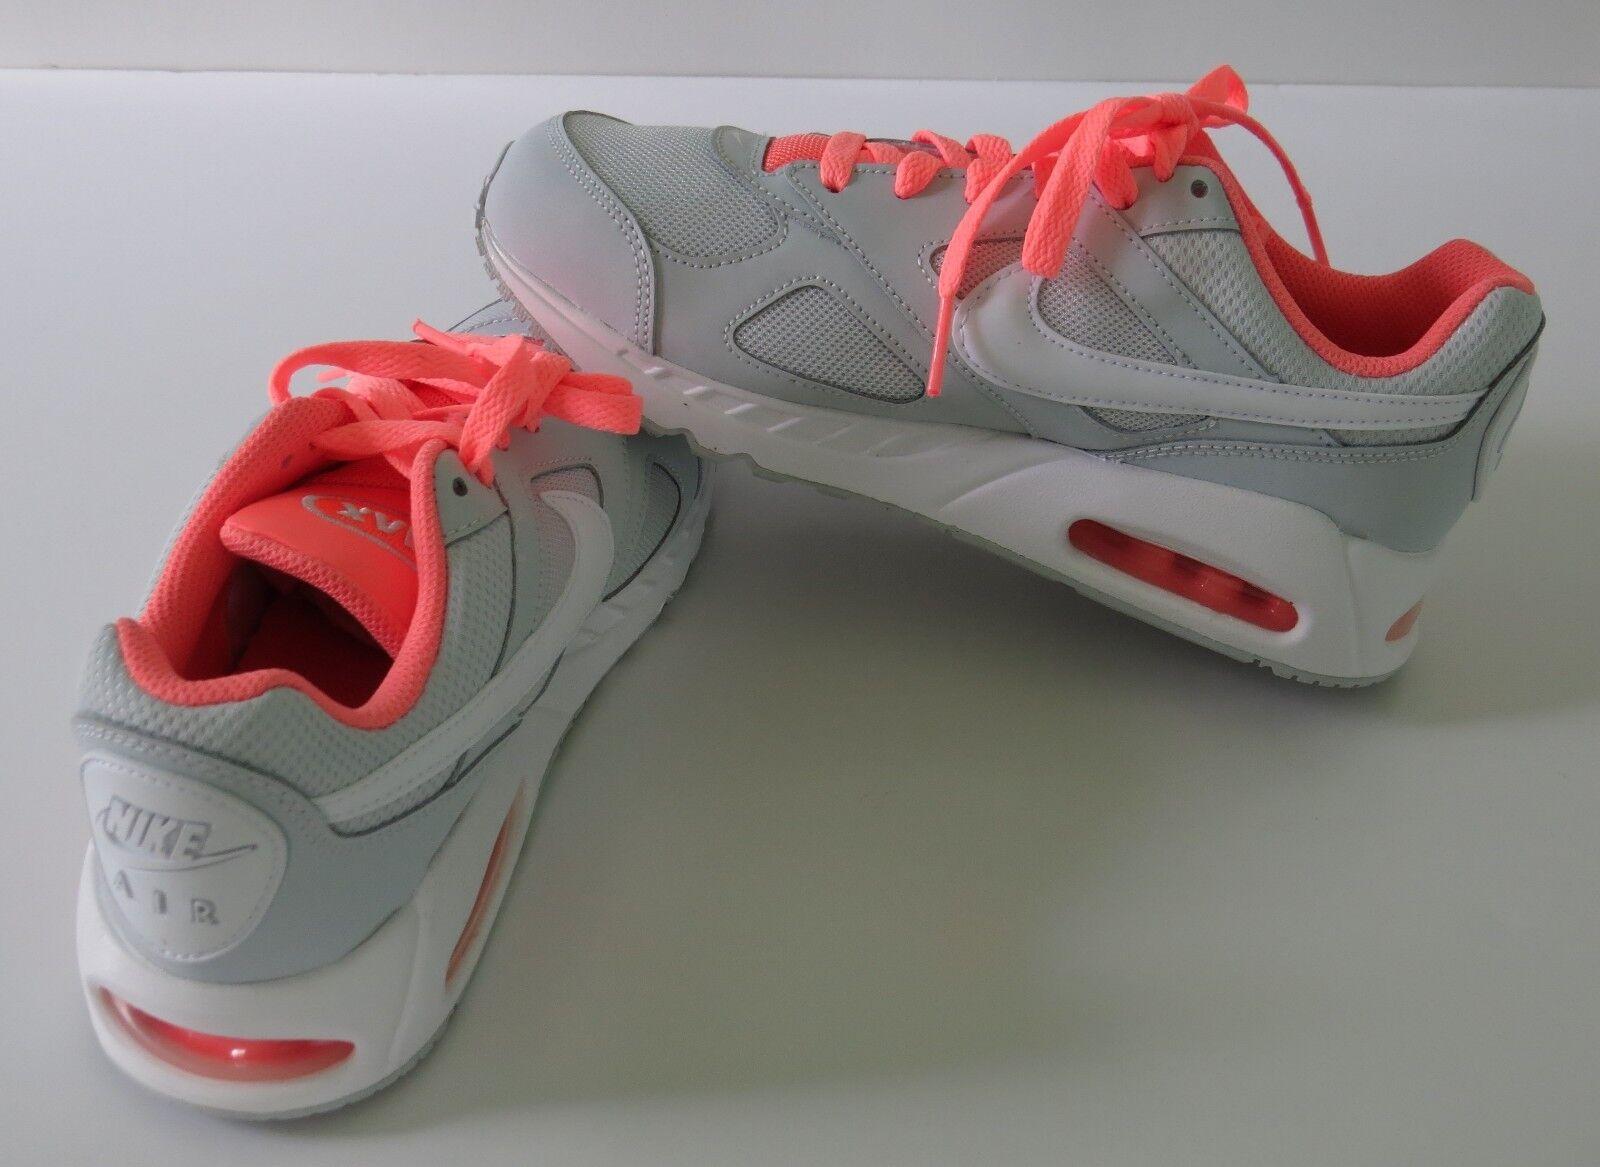 Pennino nike air max donne iv0 gs dimensioni 5.5y ragazze donne max scarpe coral arancione grigio platino 47af02